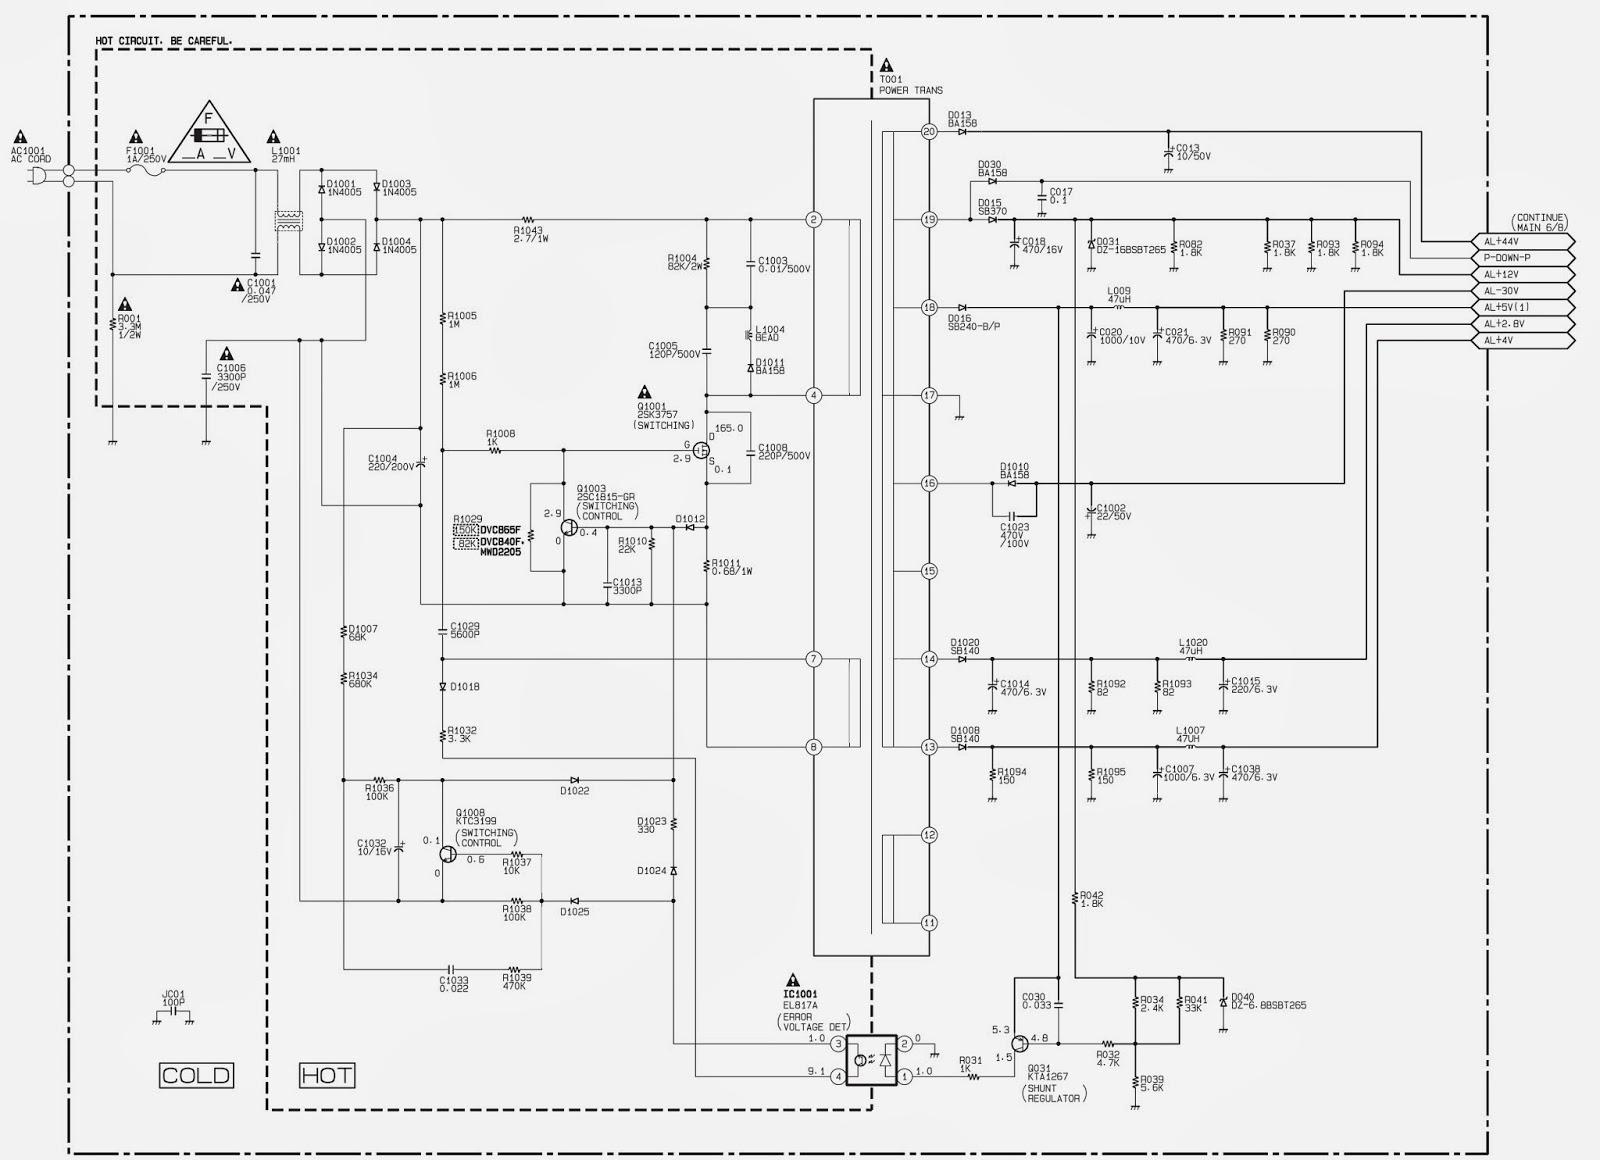 medium resolution of dvds2700 power supply smps schematic circuit diagram dvd data dvds2700 power supply smps schematic circuit diagram dvd